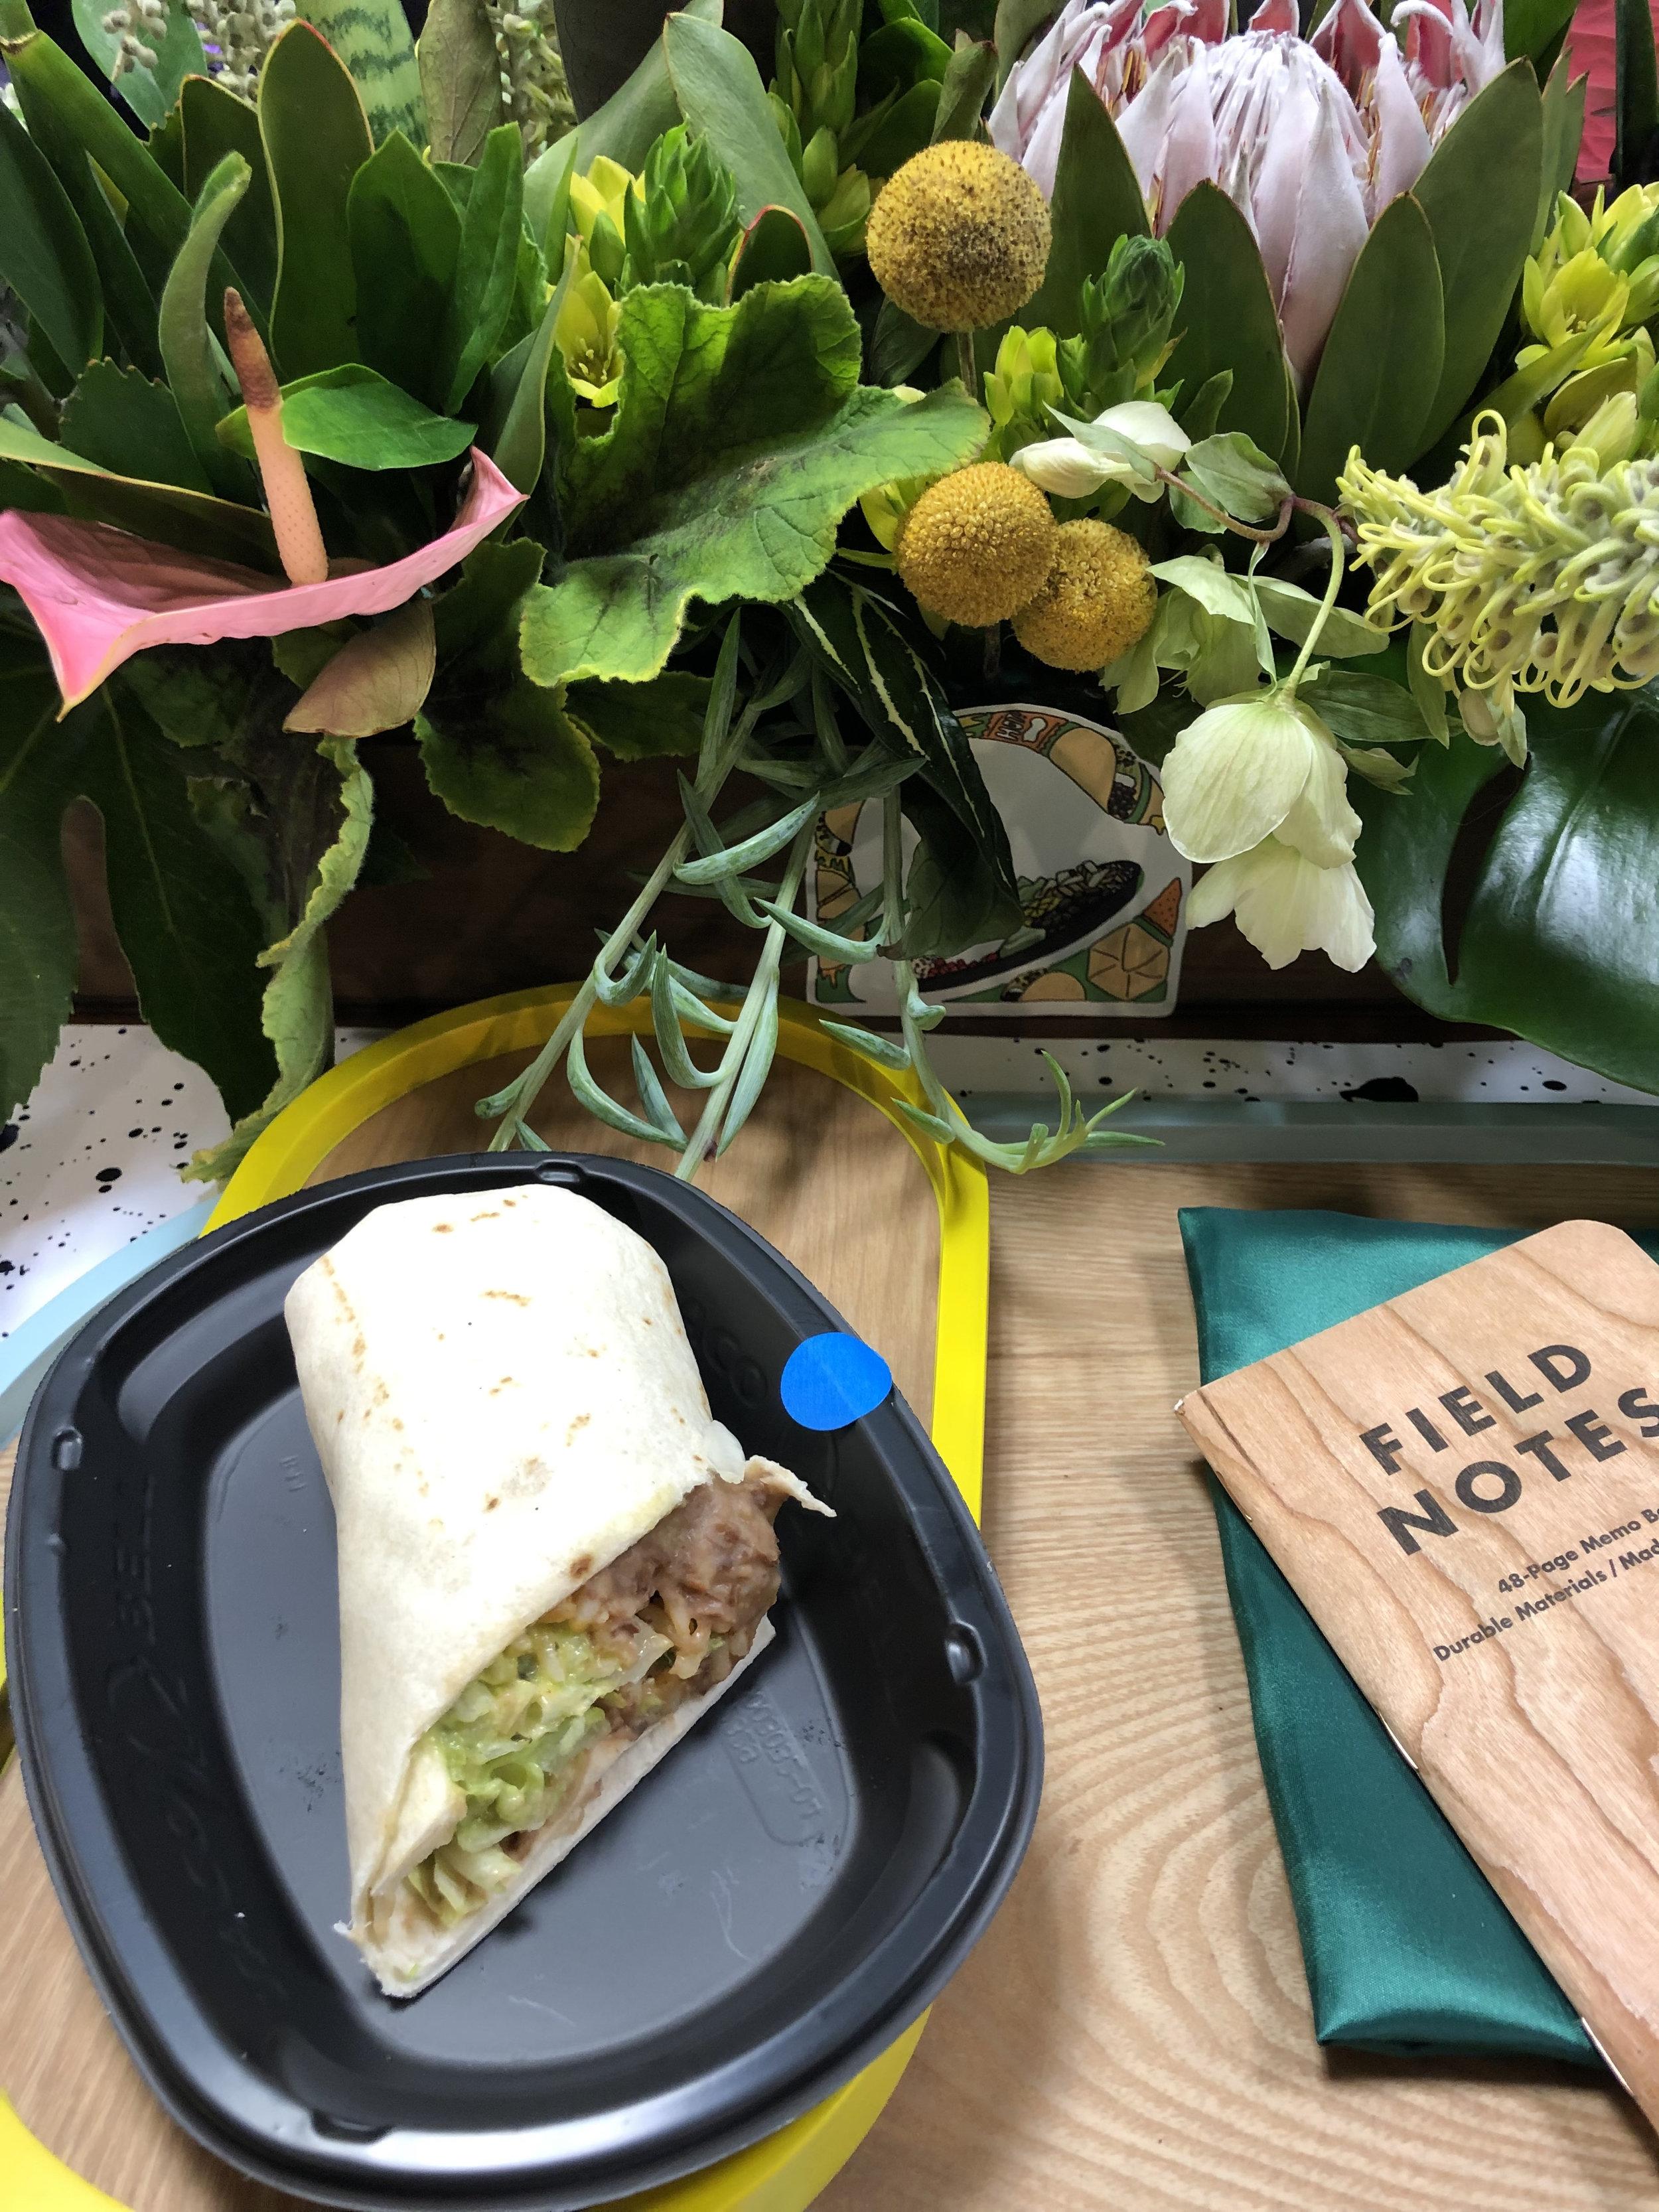 taco-bell-vegetarian-7-layer-burrito.jpg